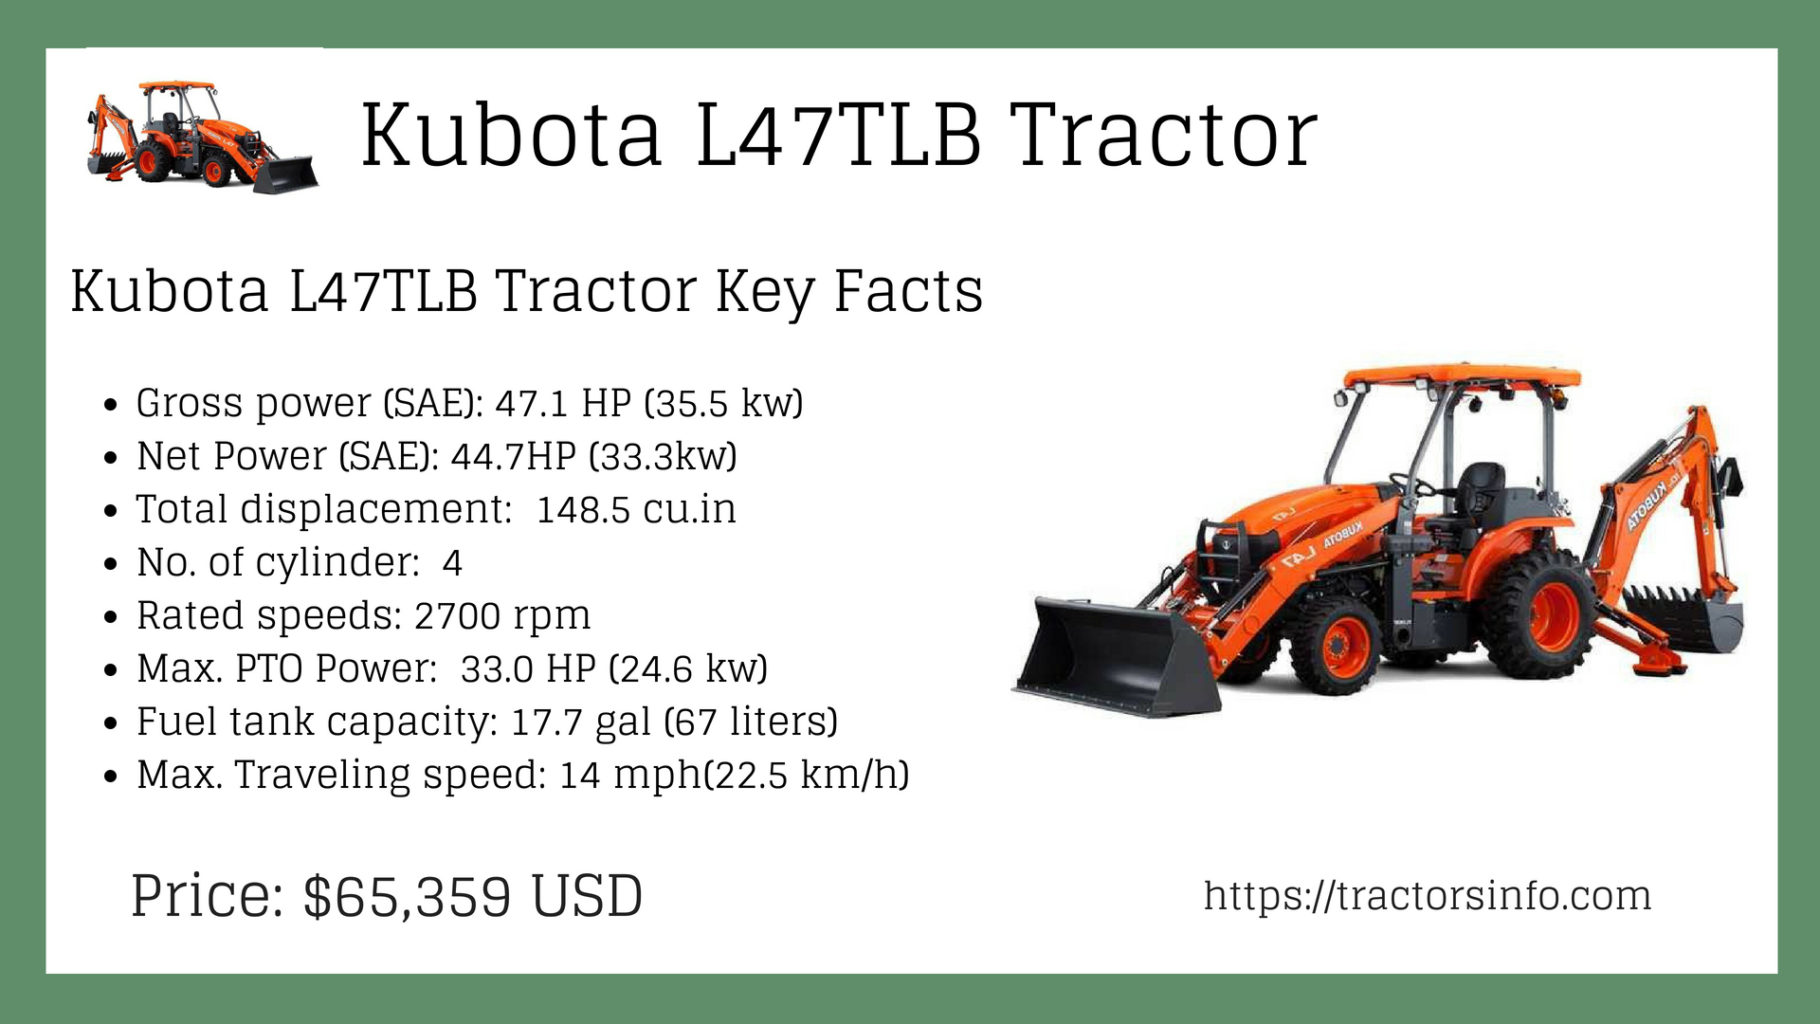 Kubota L47 TLB Tractor Price specs